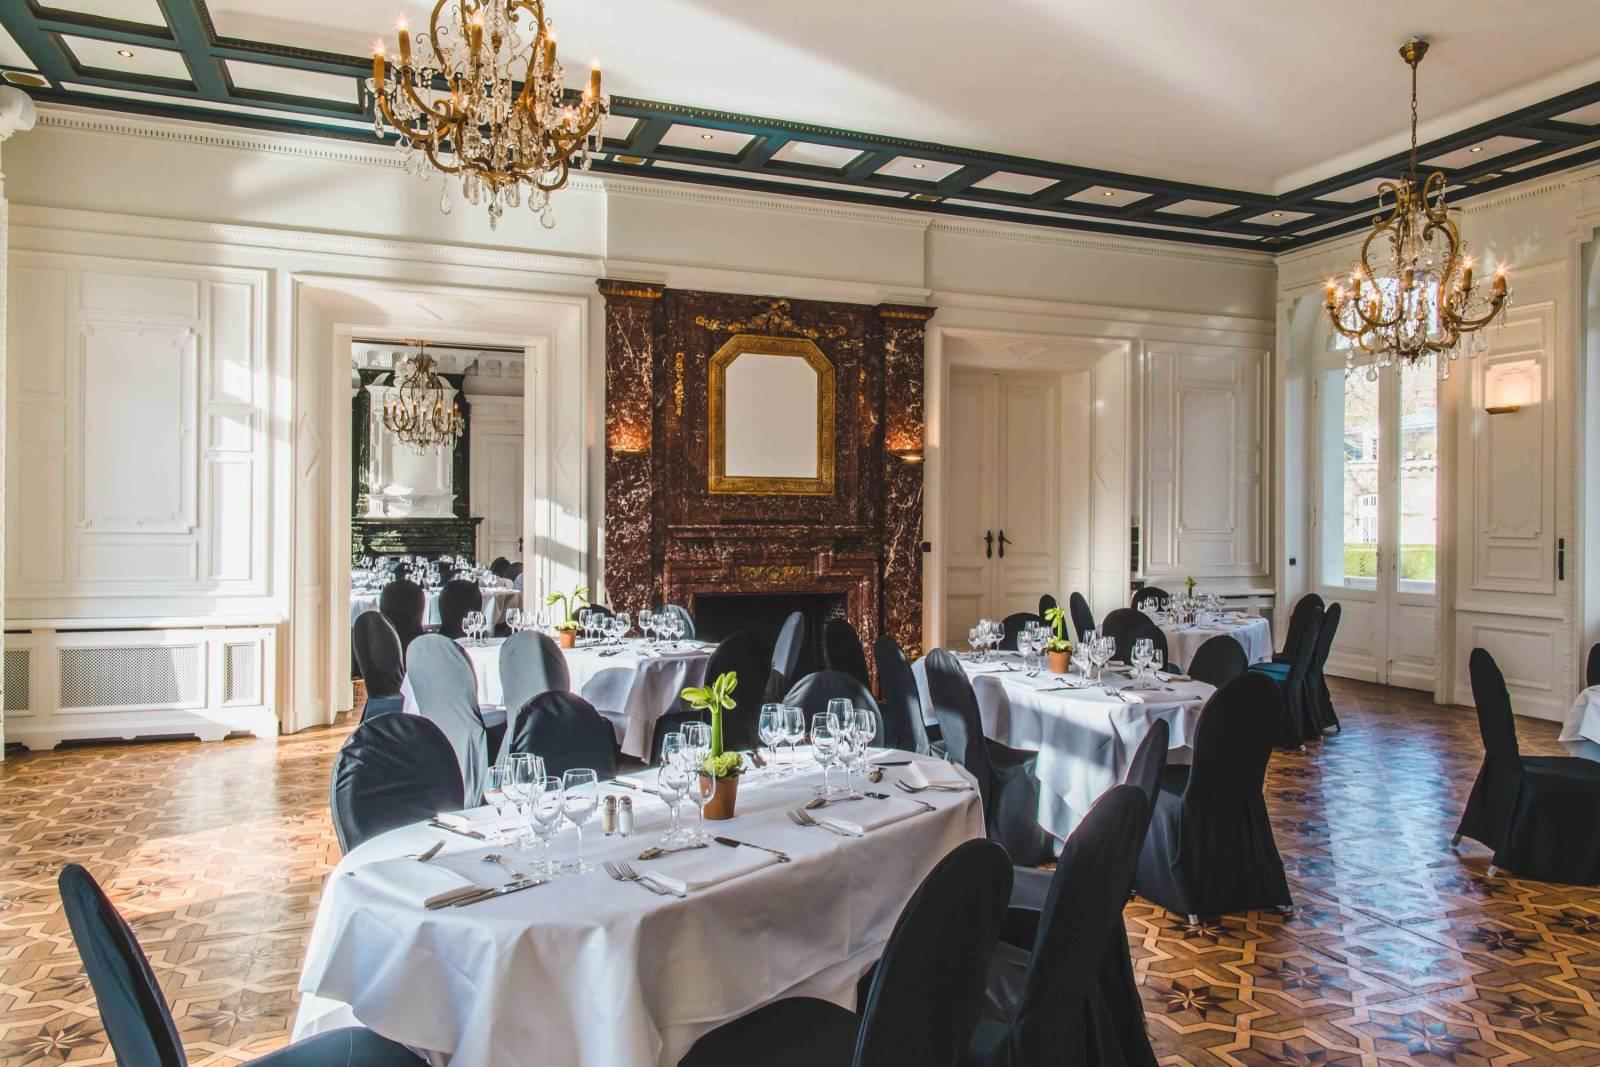 Kasteel Den Brandt - Feestzaal - Trouwzaal - Kasteel - House of Weddings - 28